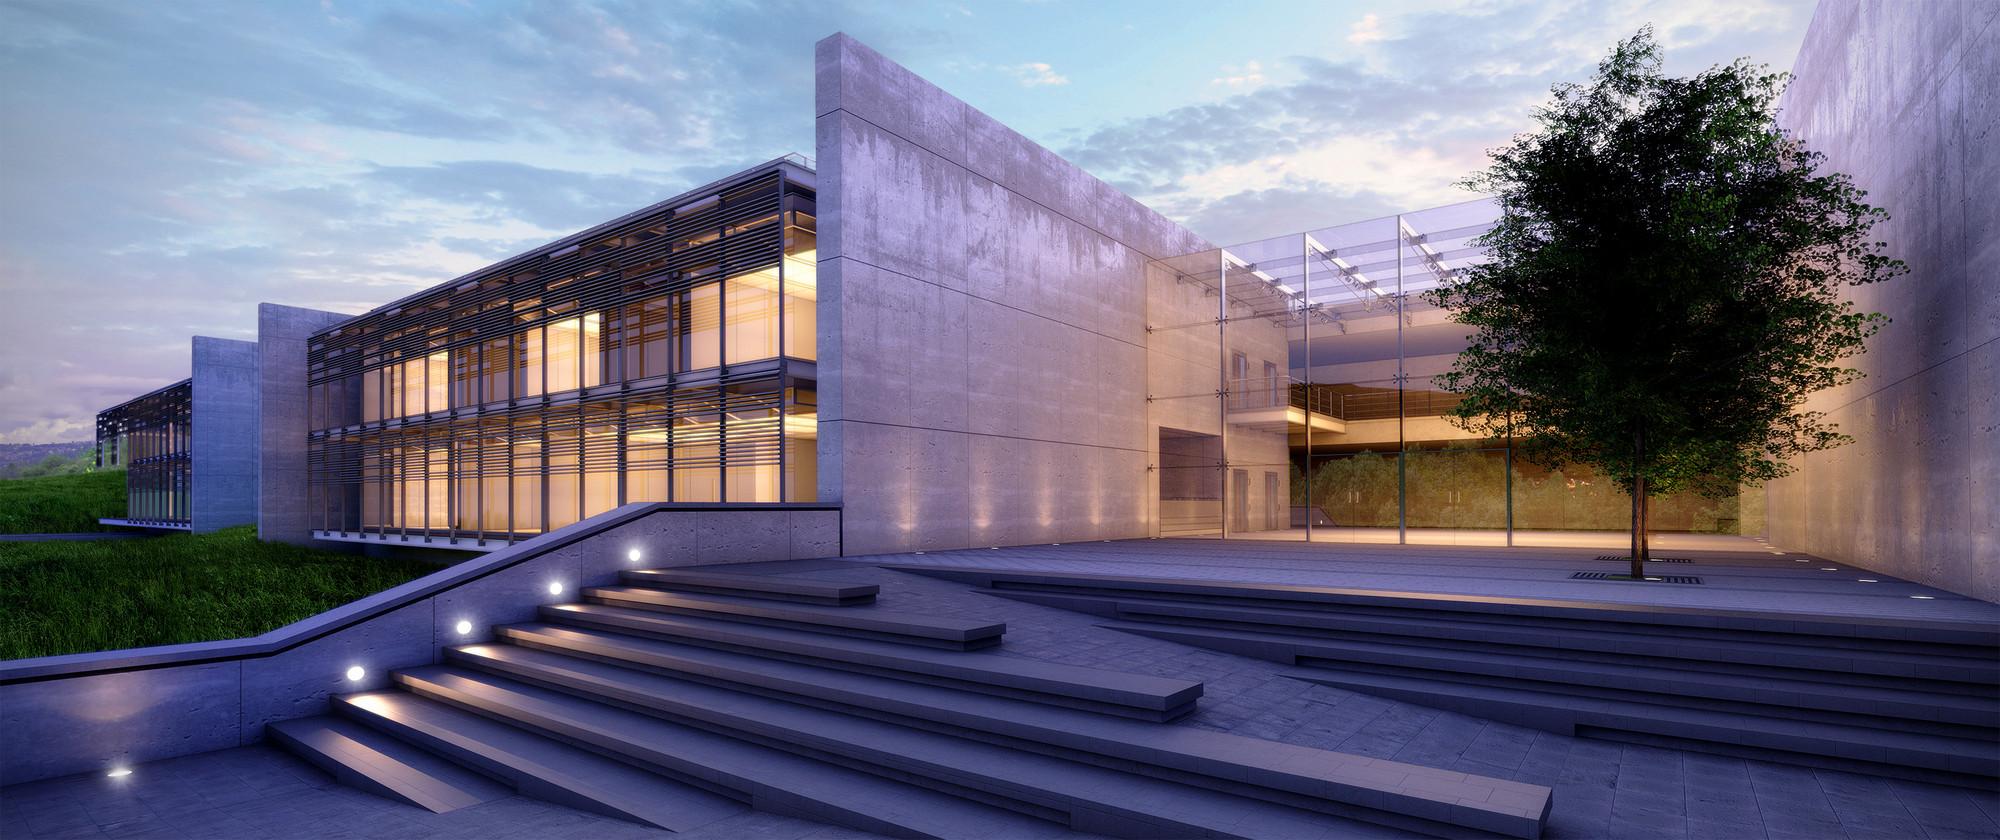 Arq. David Santos. Image Courtesy of Diagonal Arquitectura